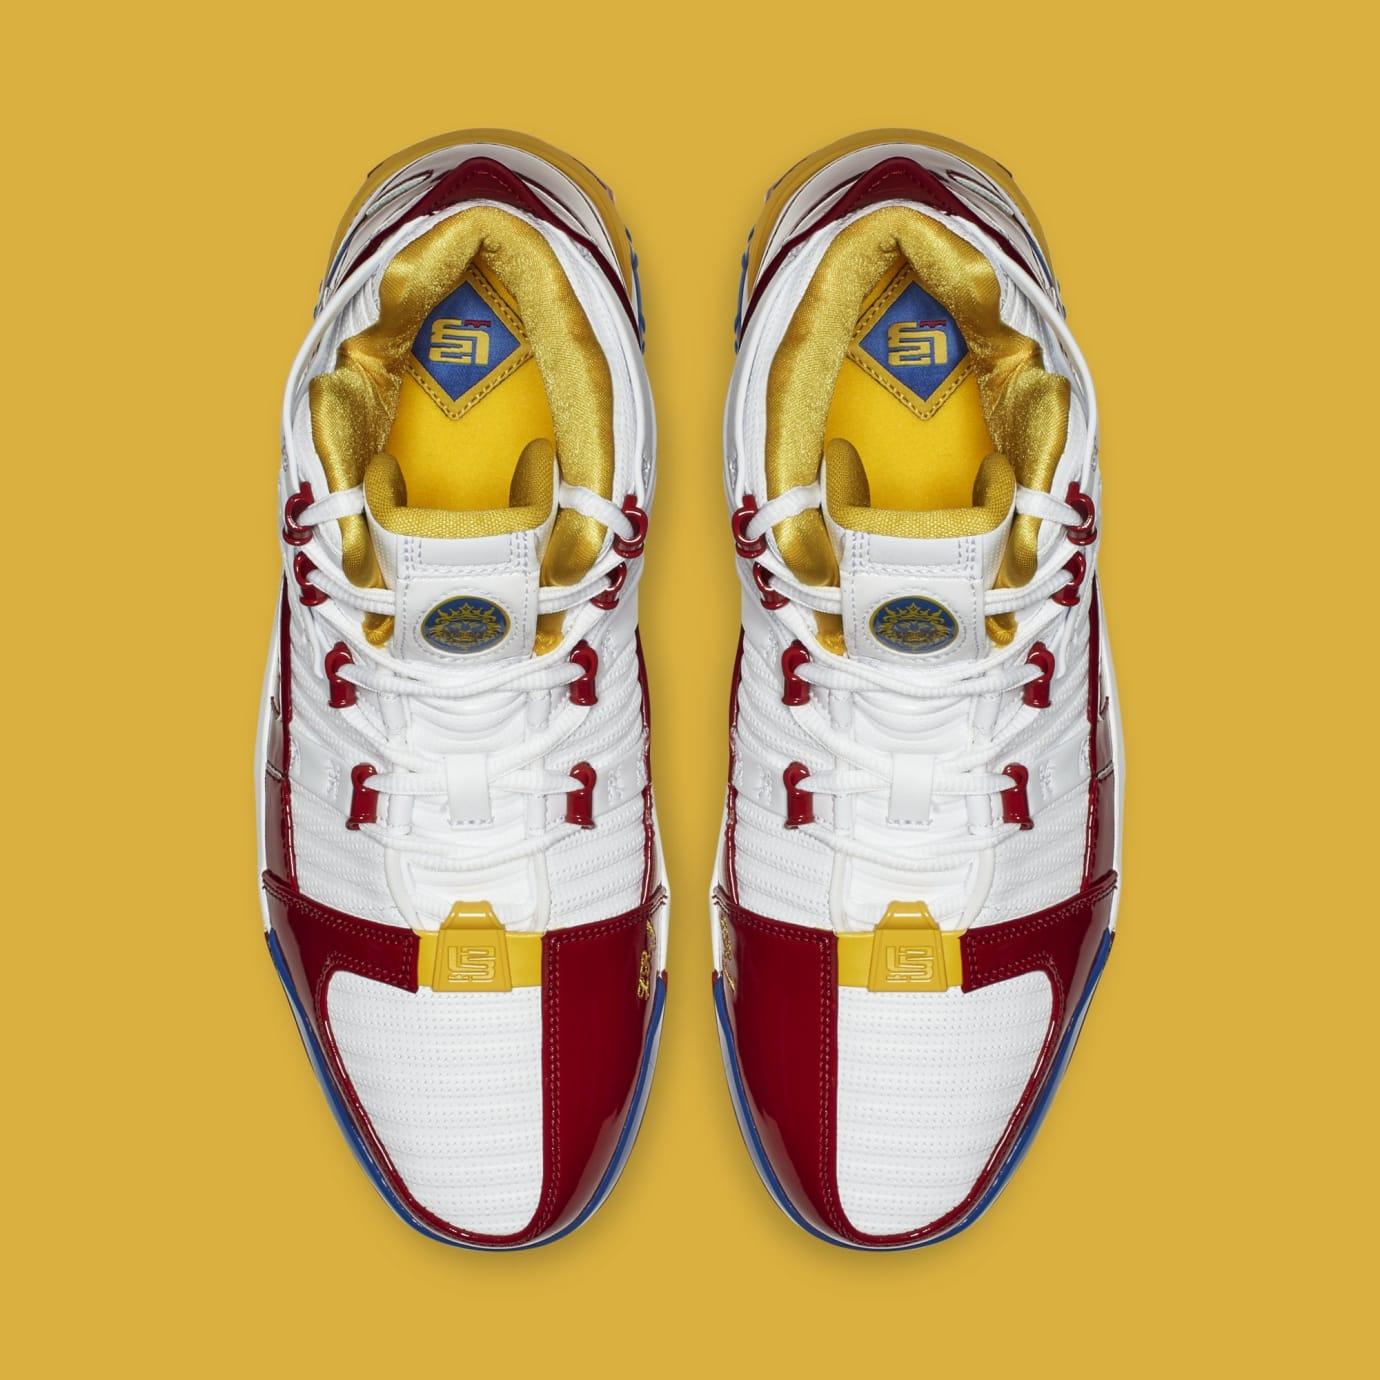 Nike Zoom LeBron 3 'SuperBron' AO2424-100 (Top)